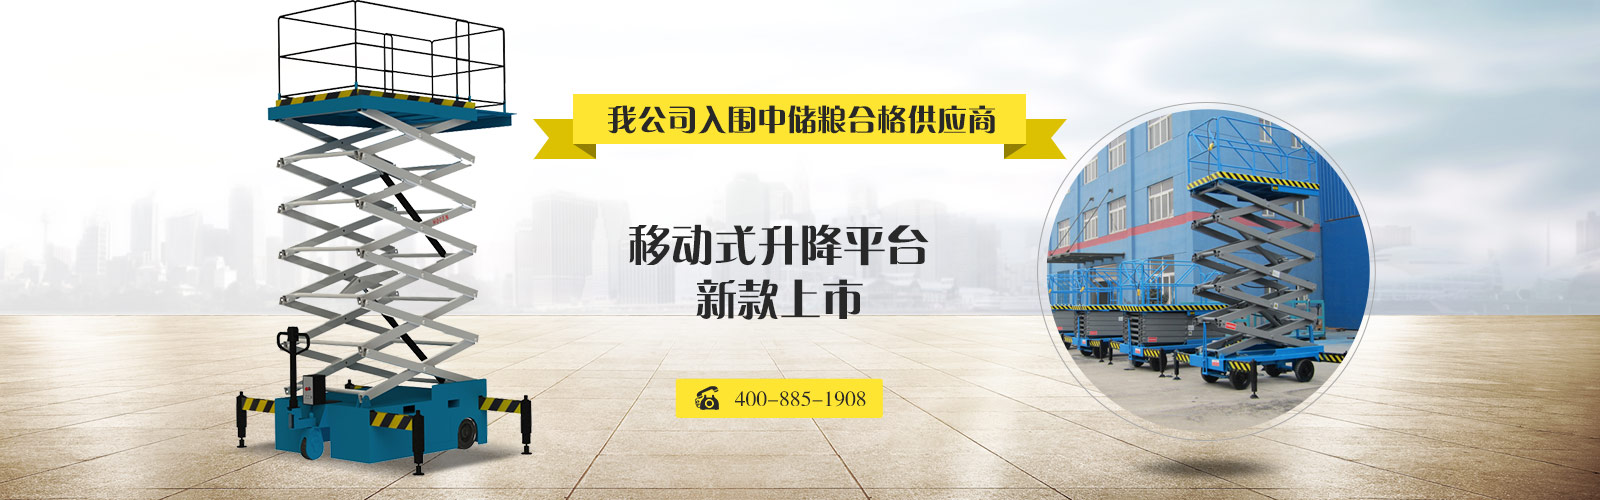 banner1中文